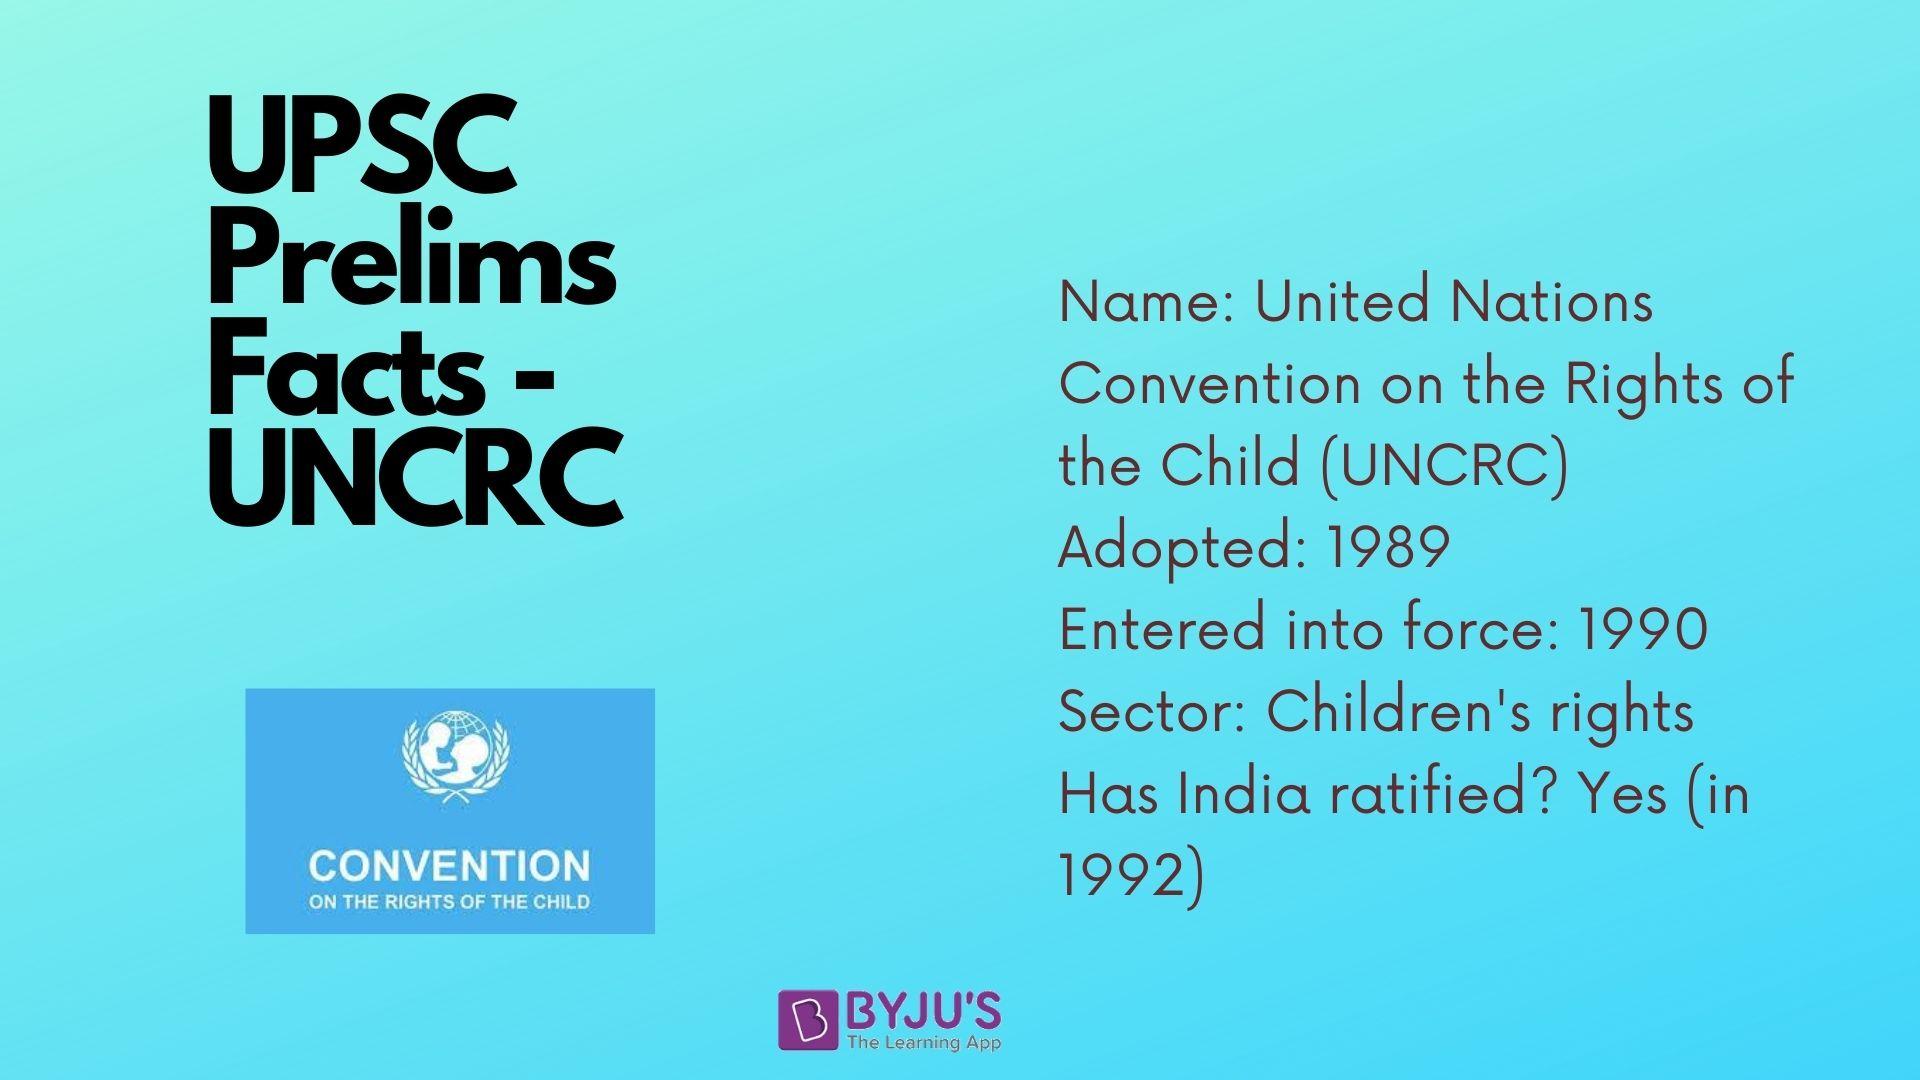 UPSC Prelims Facts - UNCRC